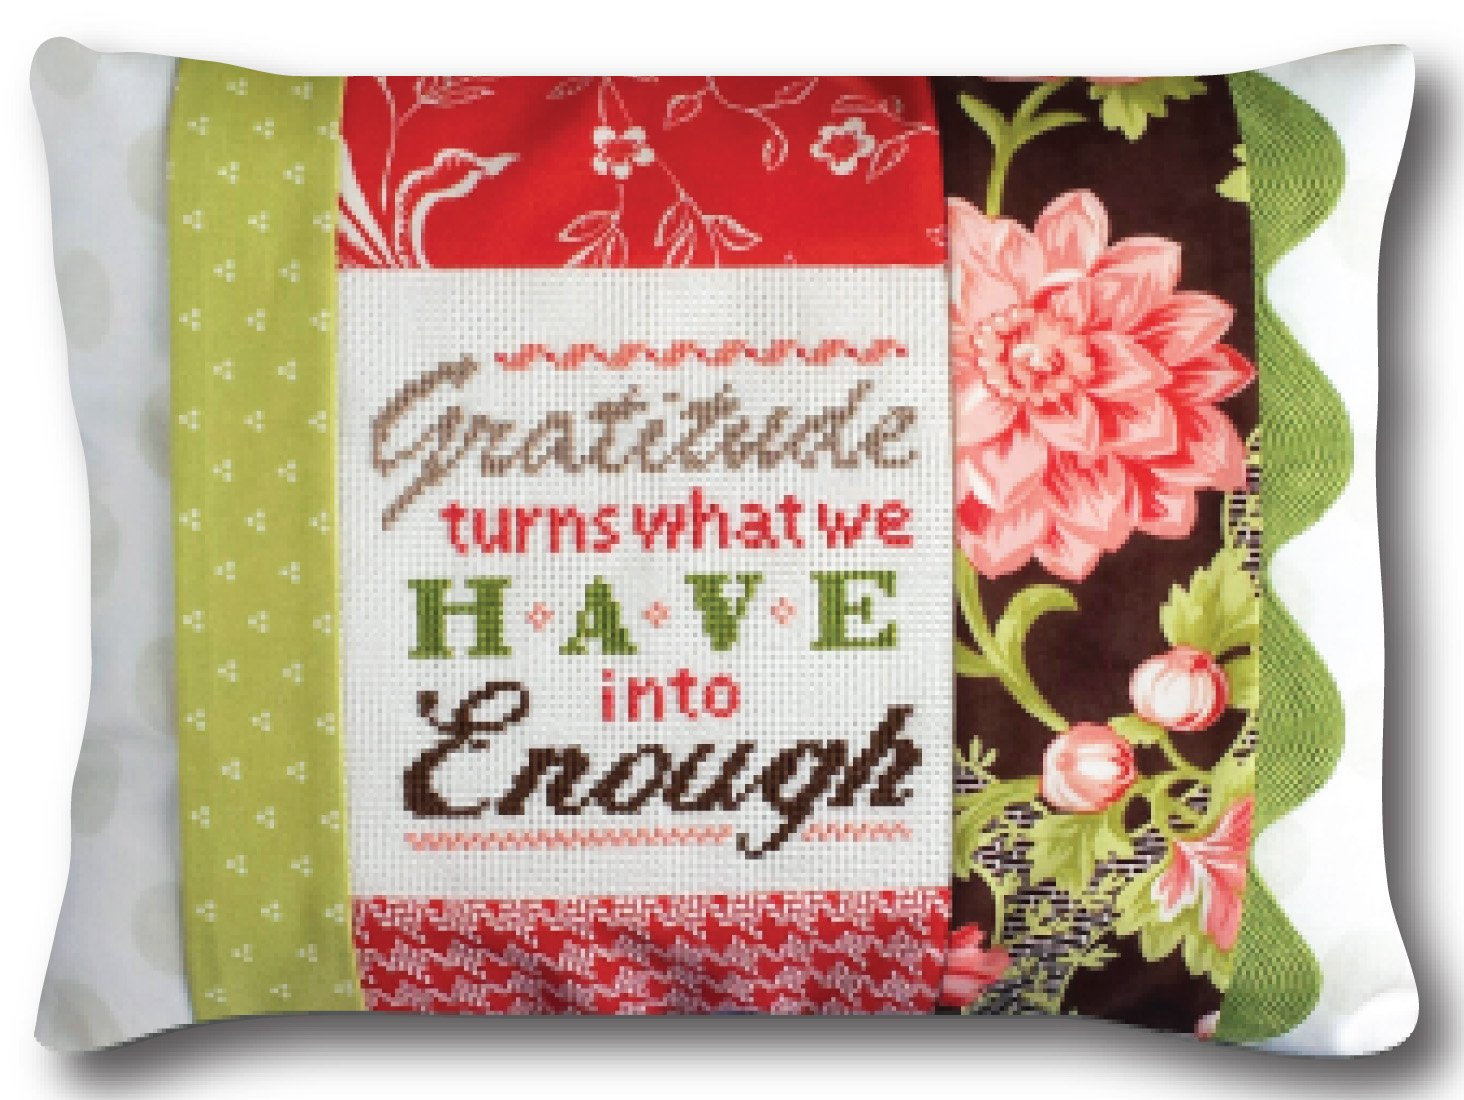 Gratitude is Enough pillow kit #1423